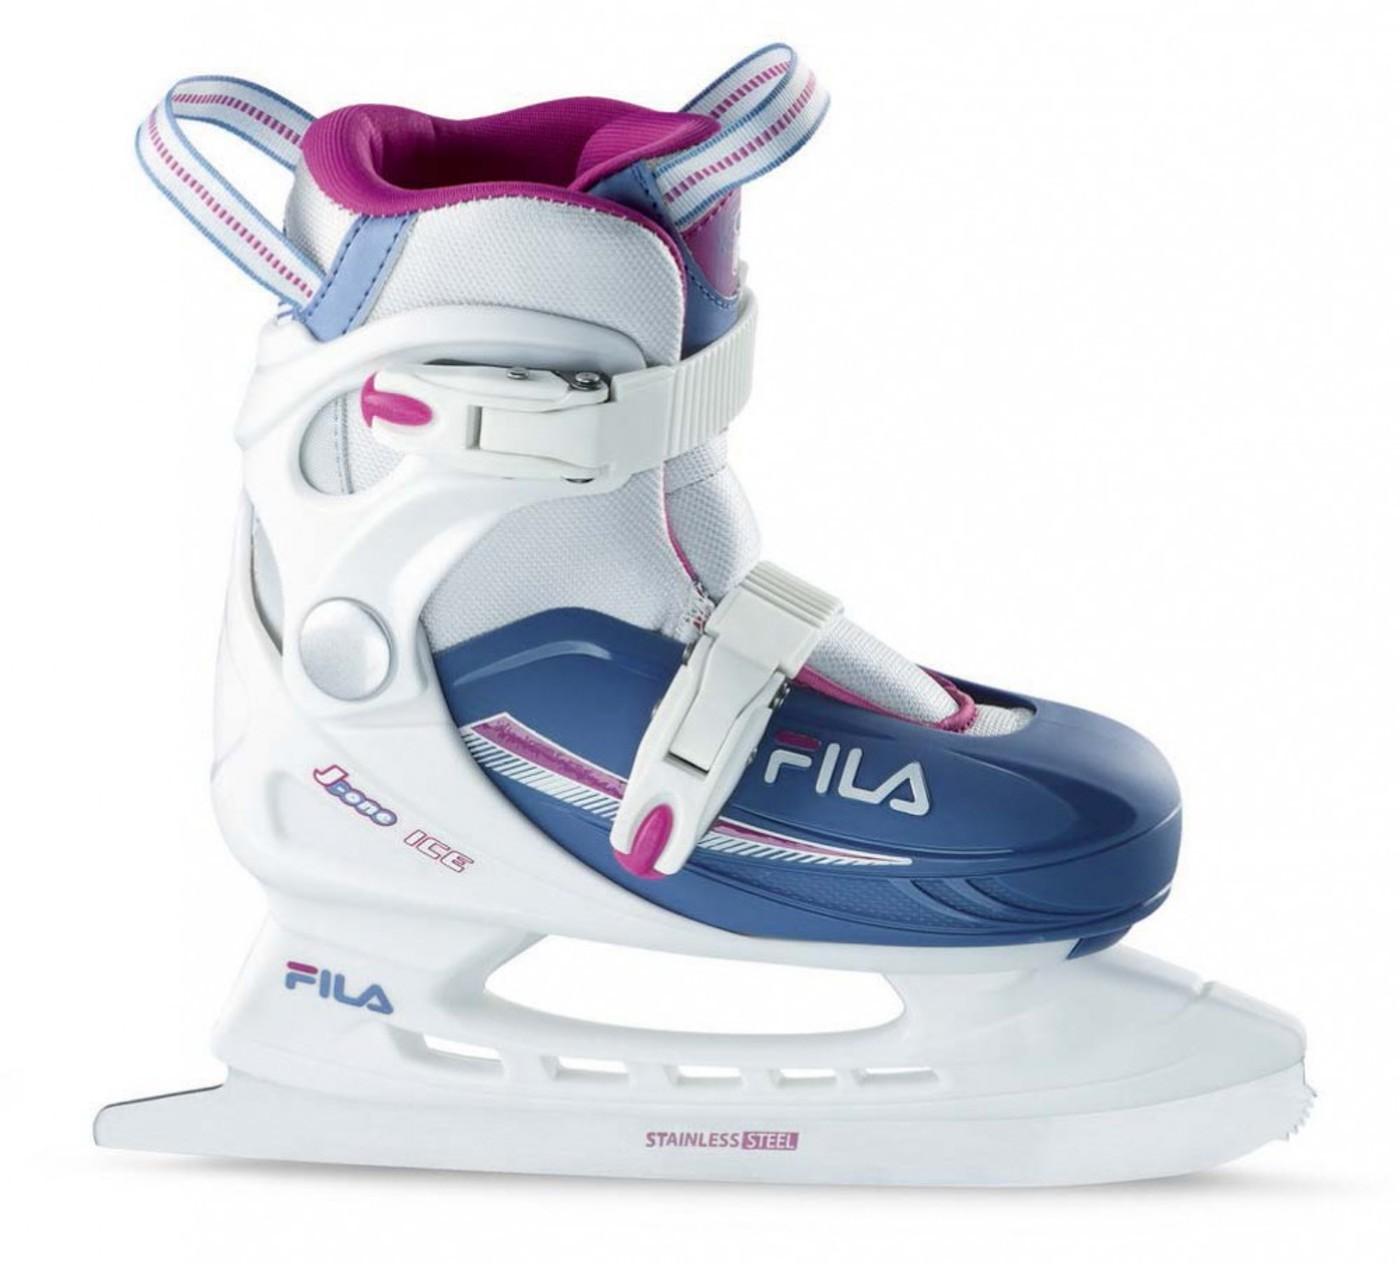 FILA J-One G Ice HR - Kinder